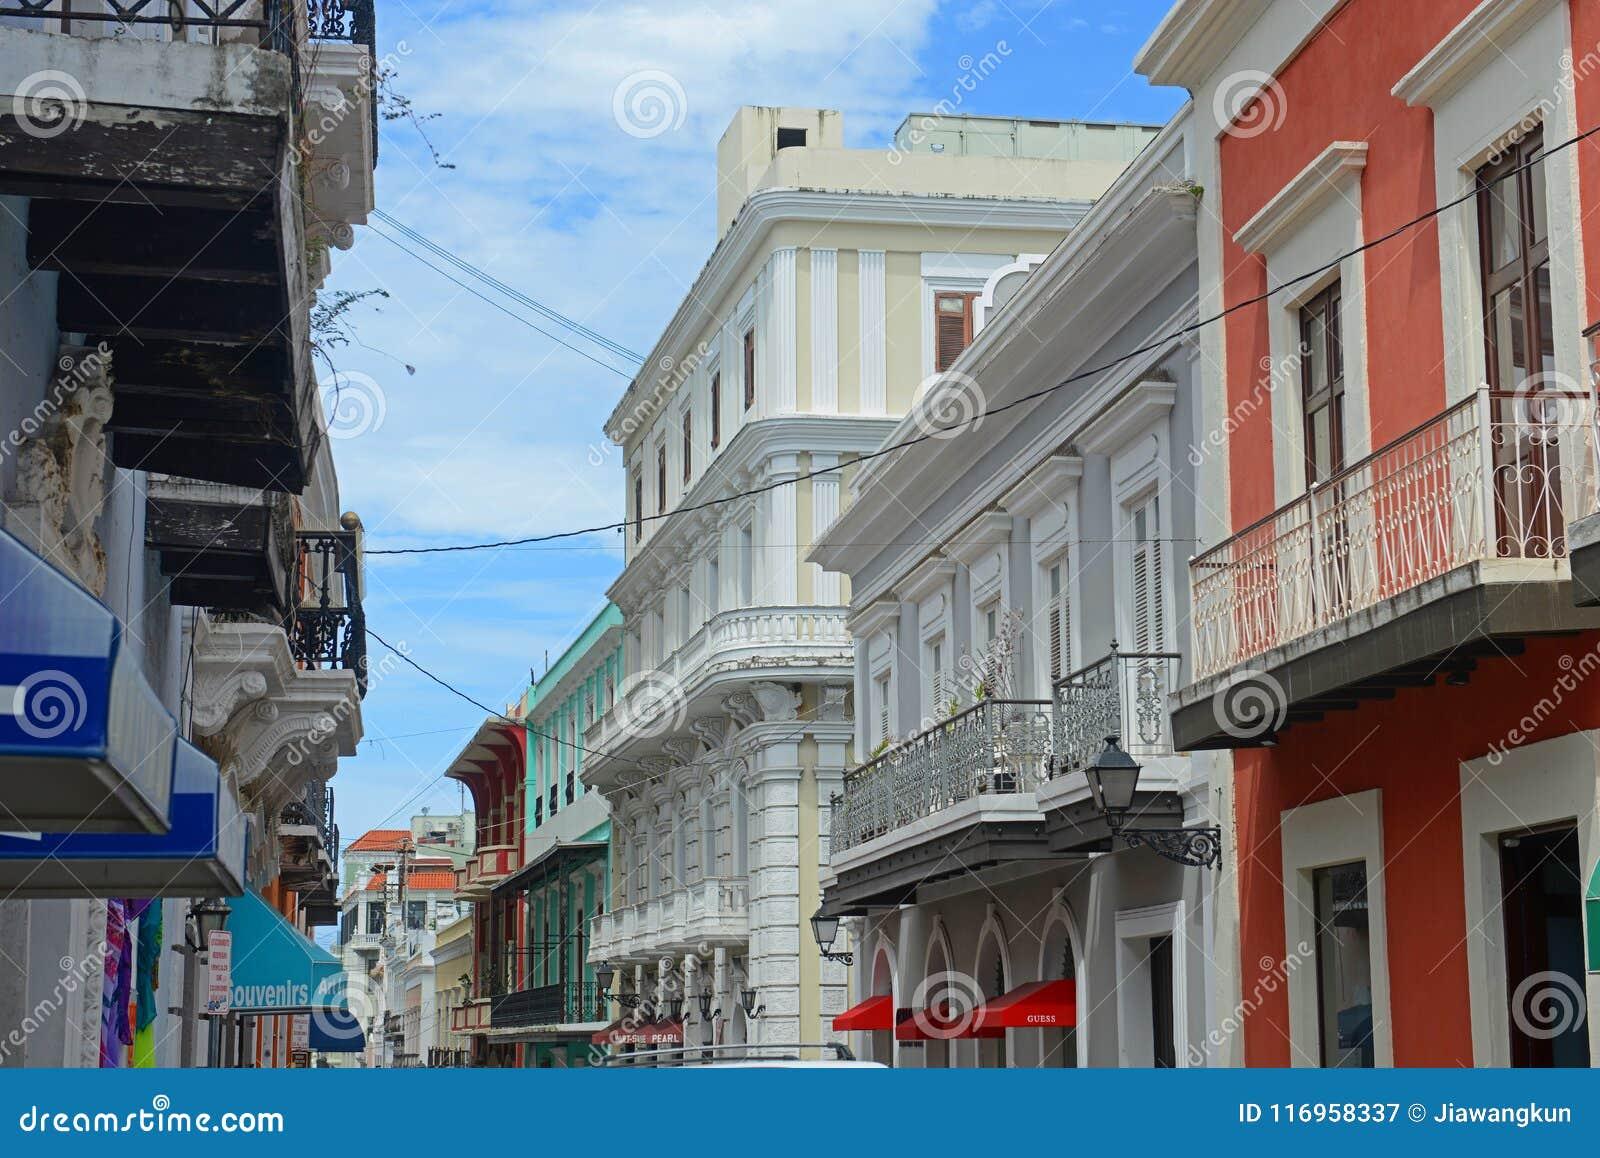 Historic building in Old San Juan, Puerto Rico